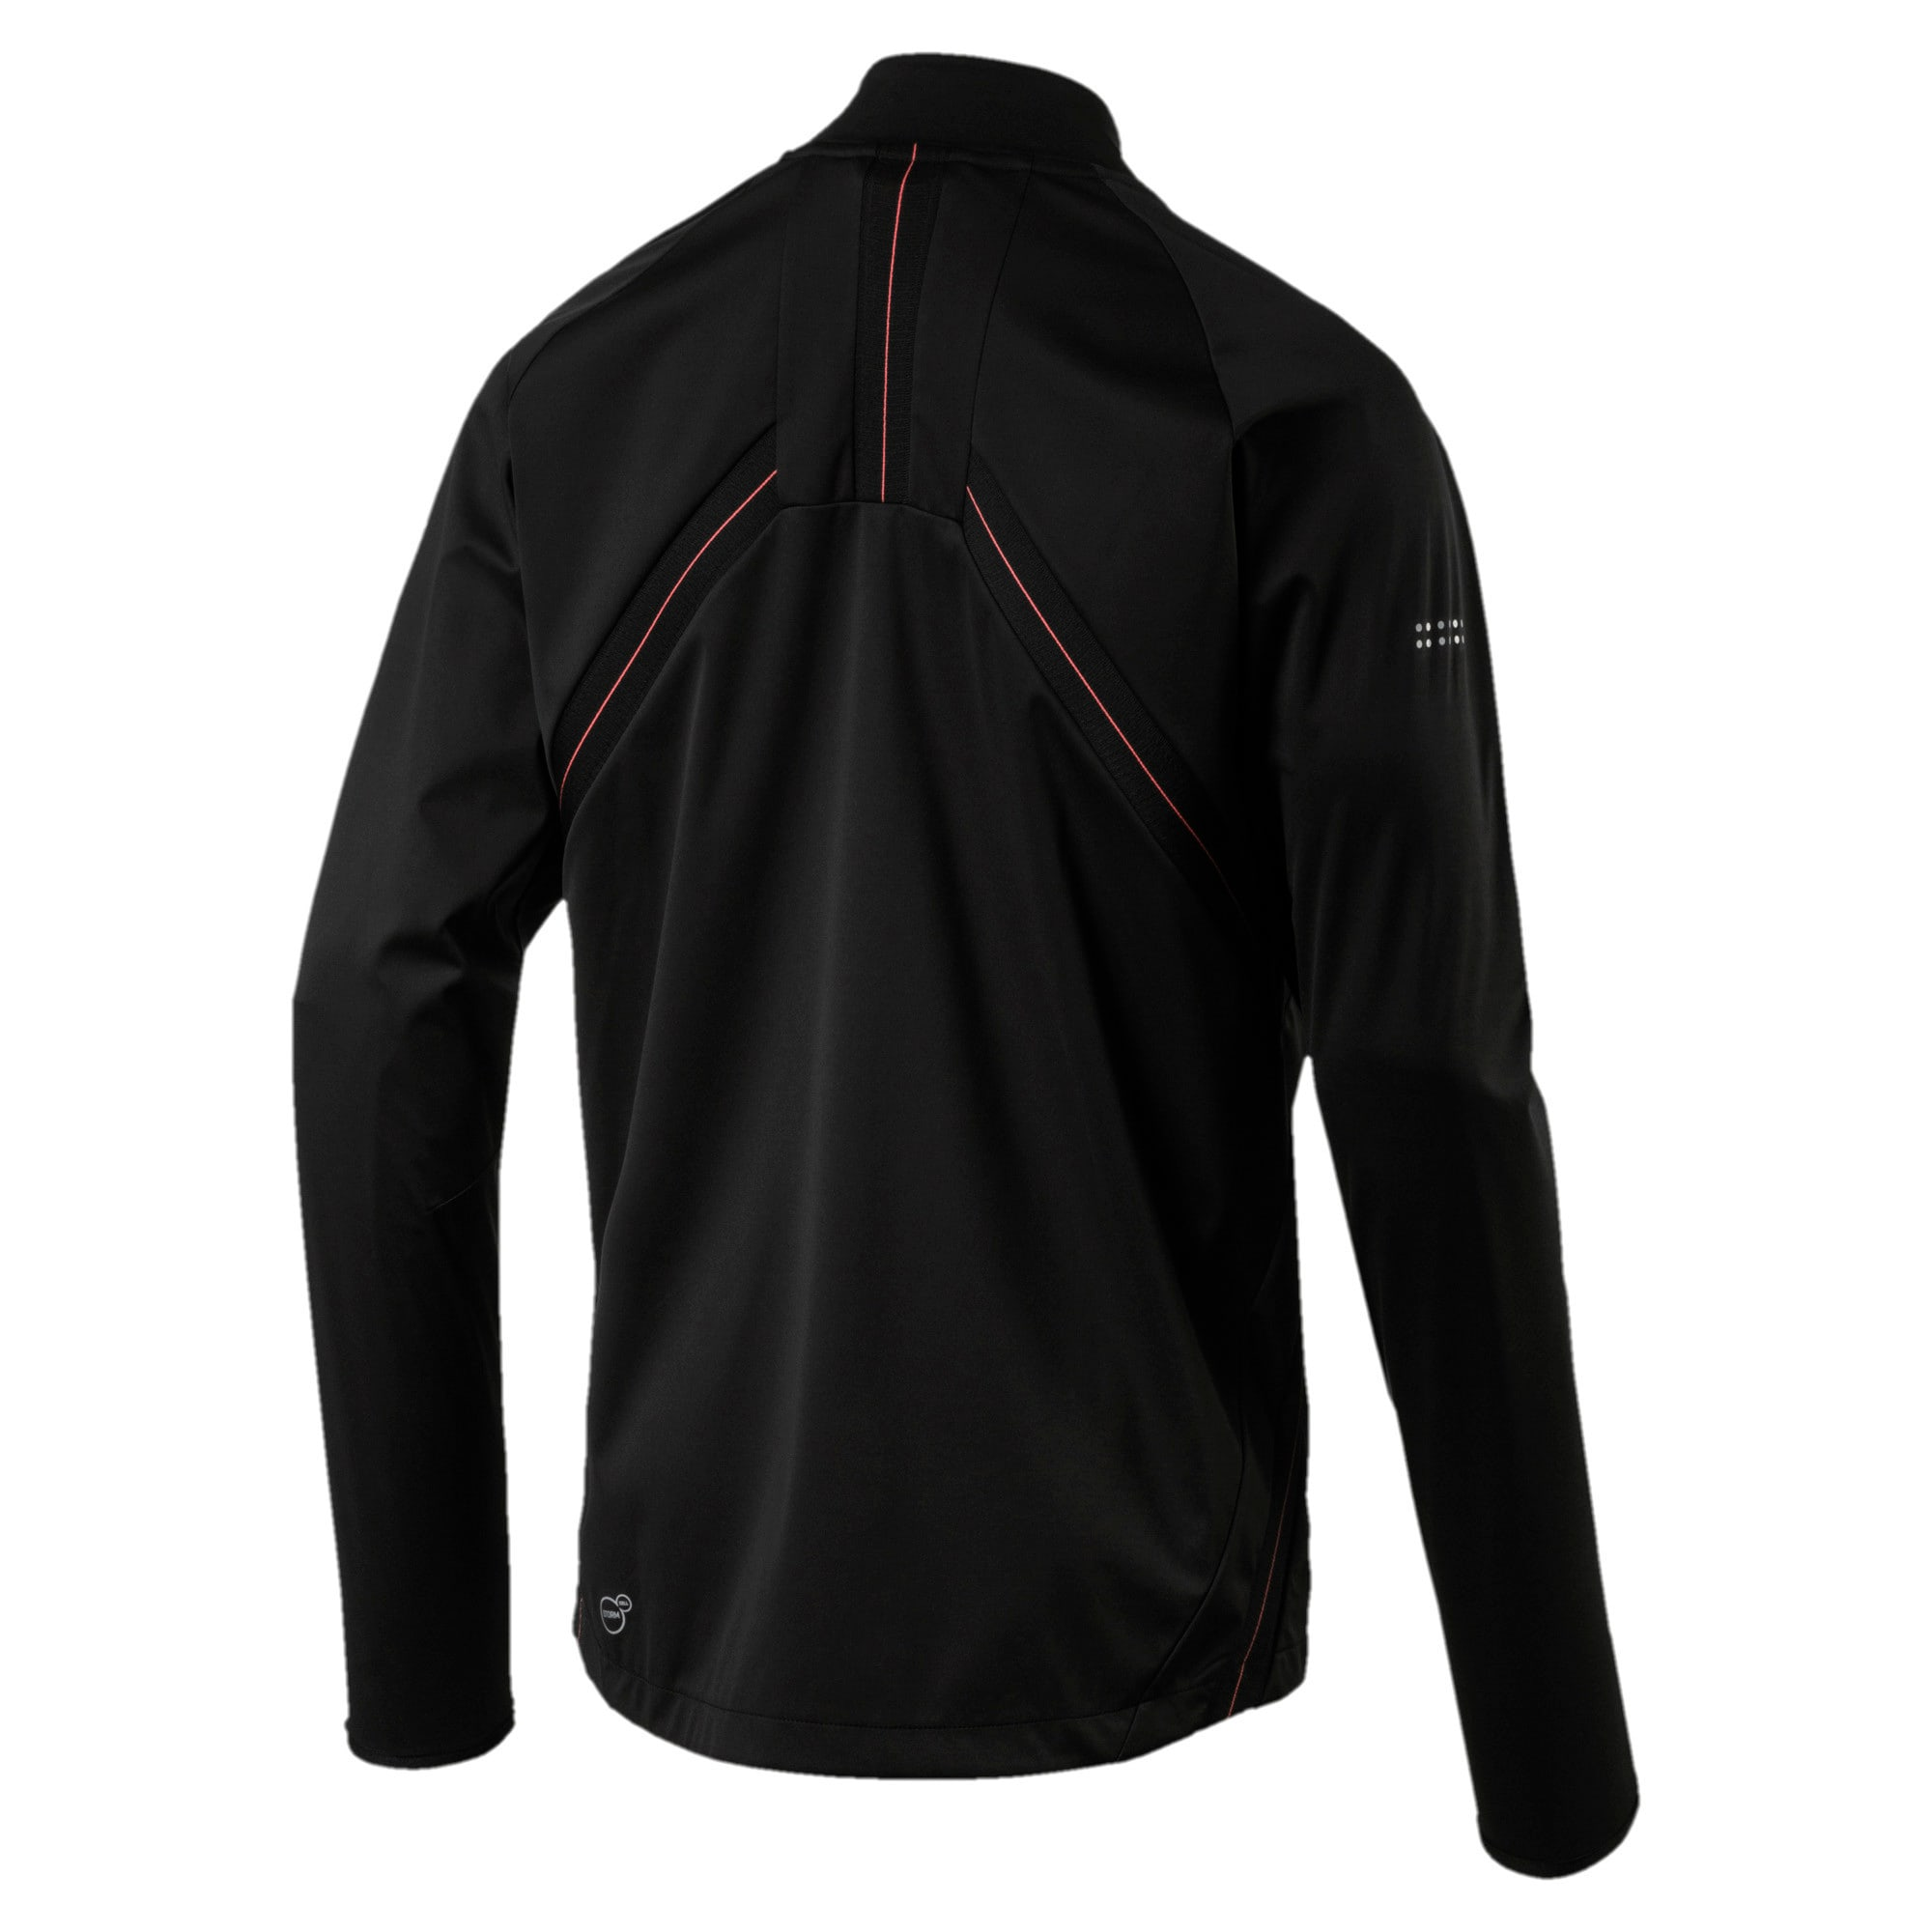 Thumbnail 3 of PWRRUN Vent Thermo-R Men's Zip-Up Running Jacket, Puma Black, medium-IND